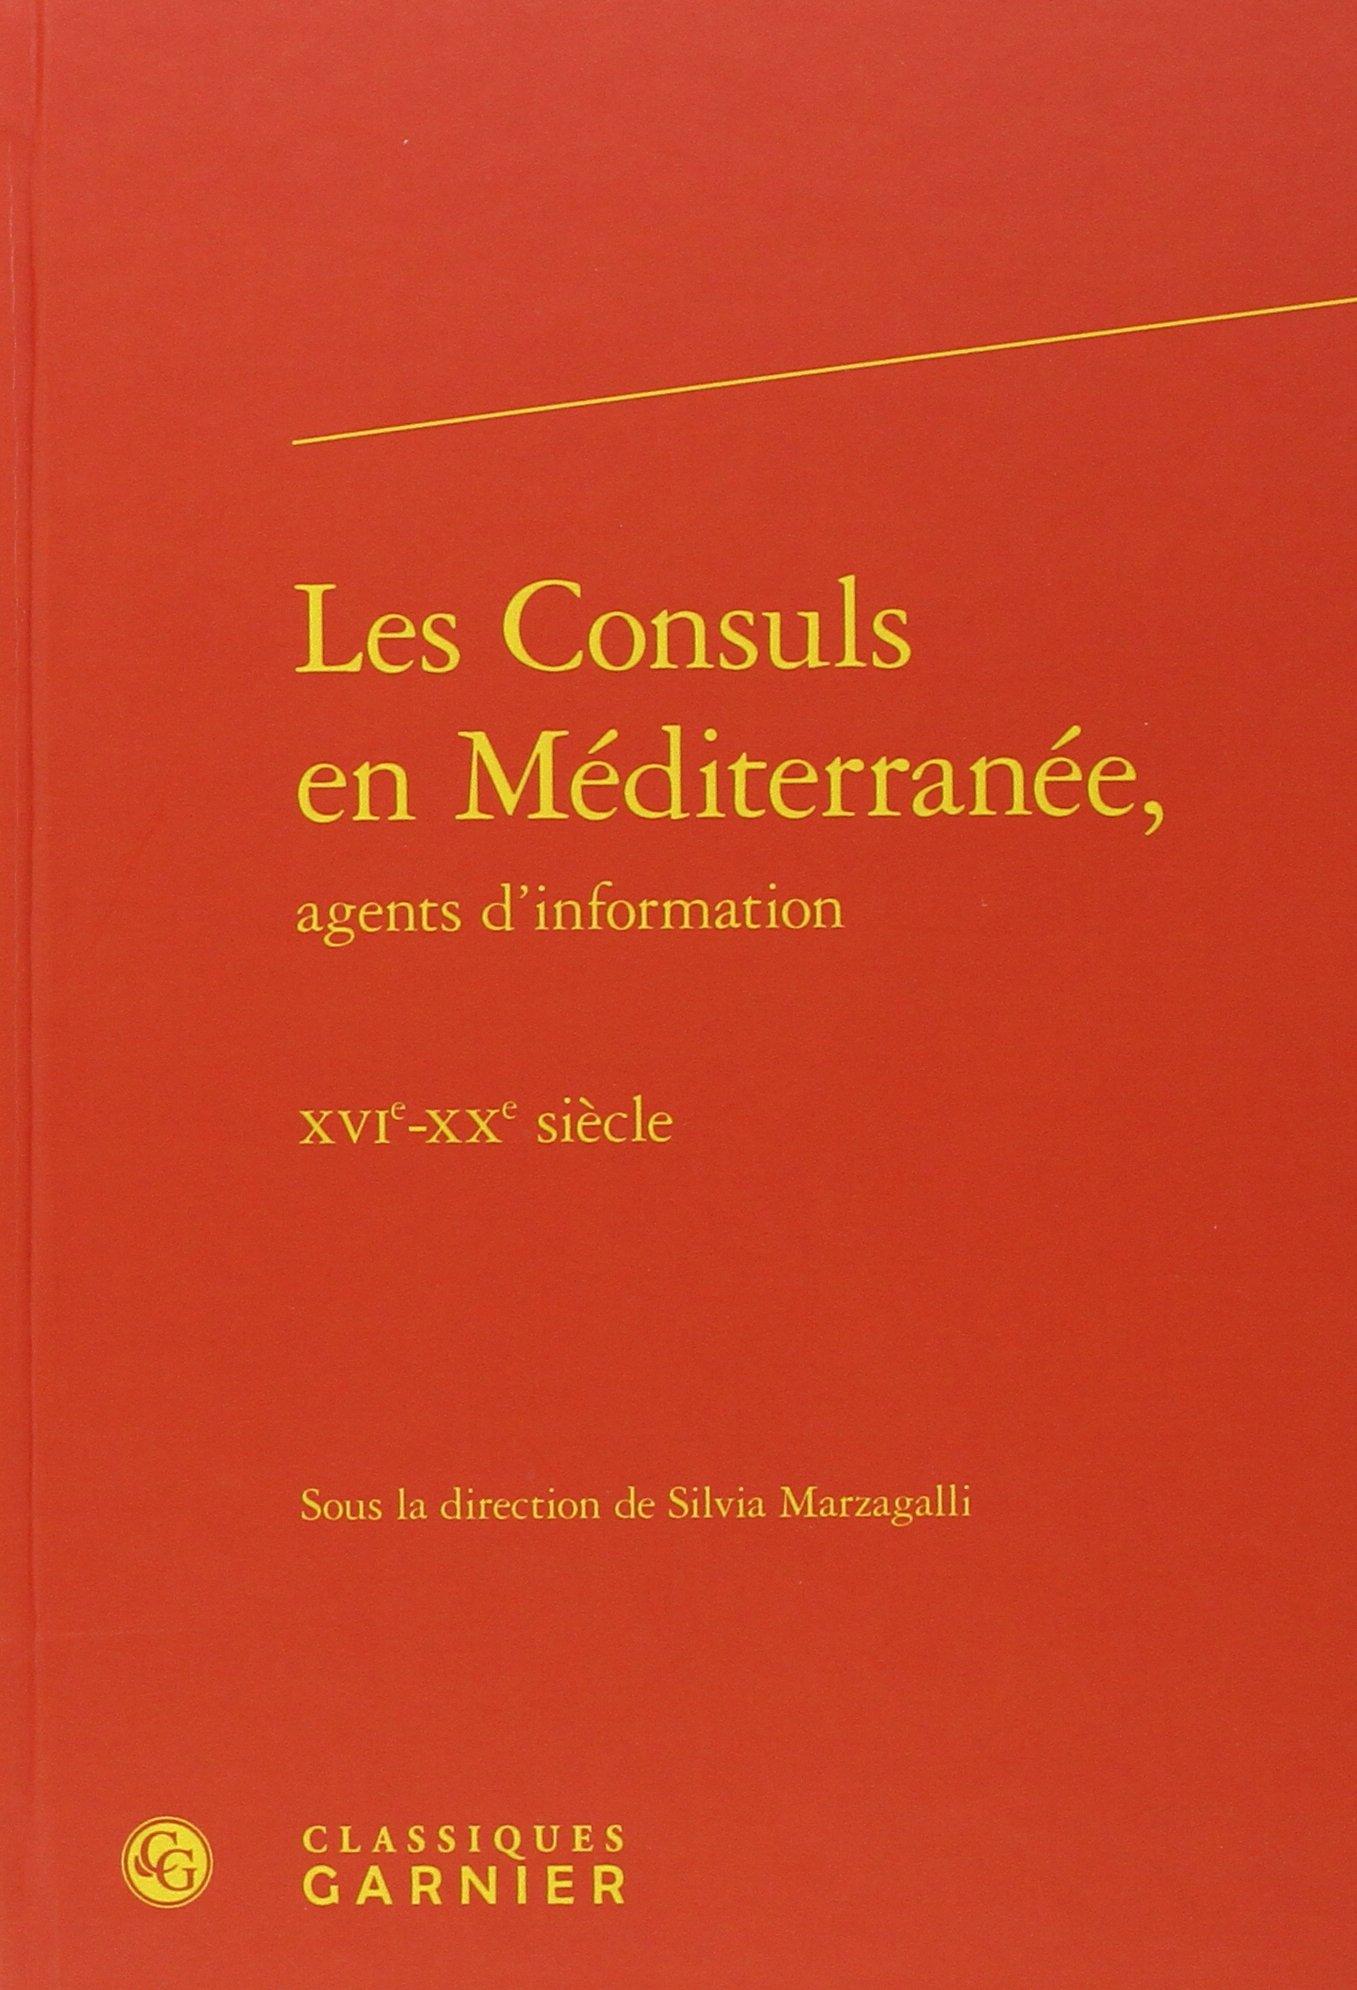 Amazon.fr - Les consuls en Méditerranée, agents d'information : XVIe-XXe  siècle - Collectif, Silvia Marzagalli - Livres